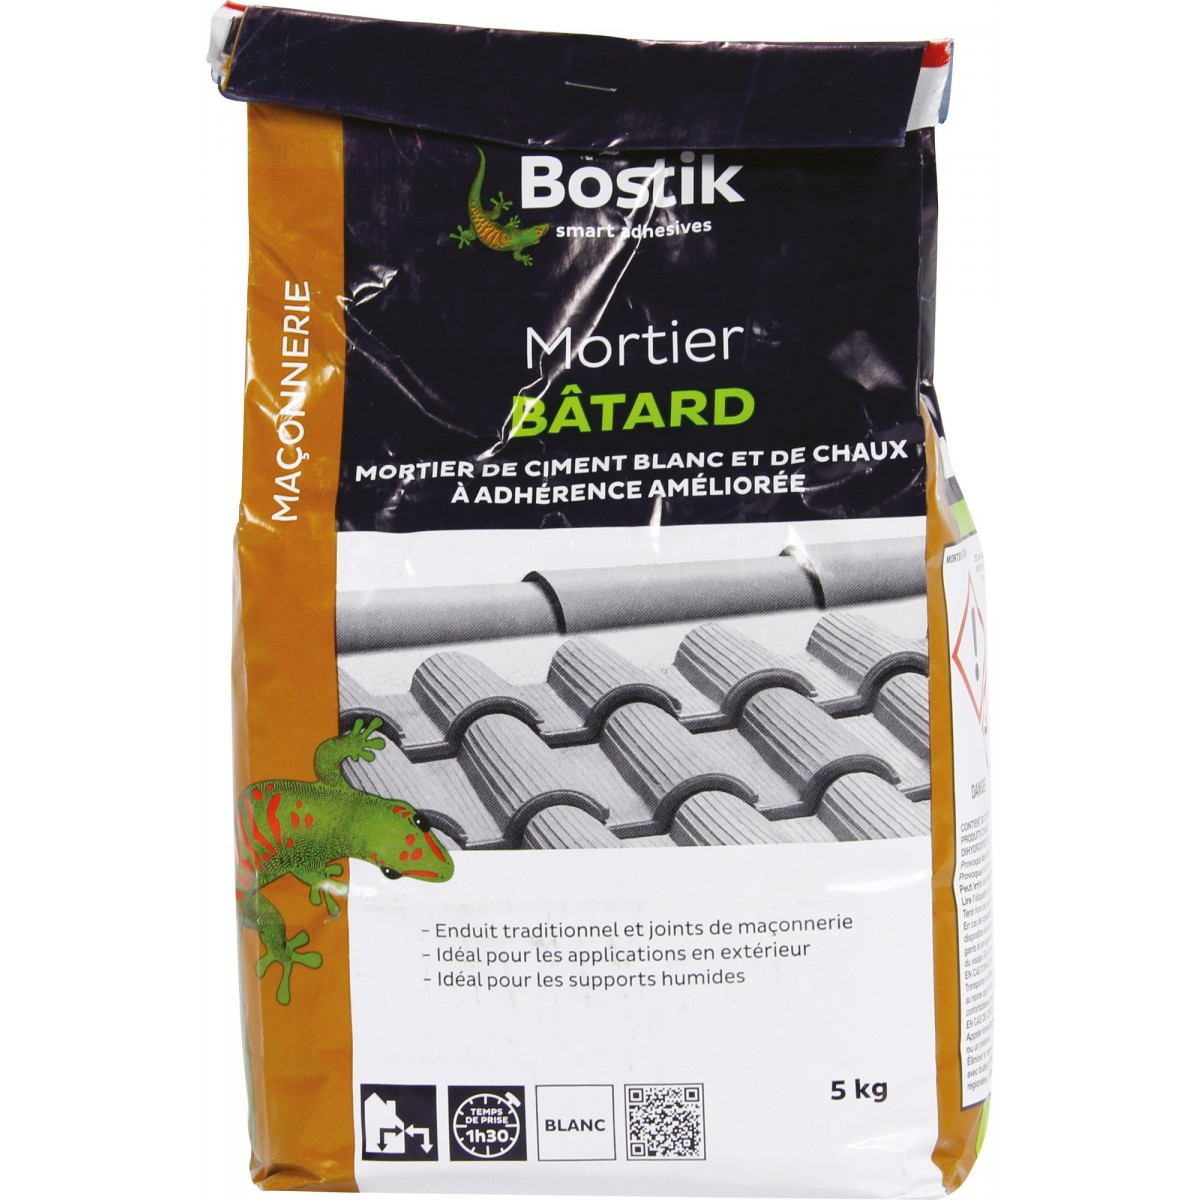 Mortier batard Bostik - Sac 5 kg